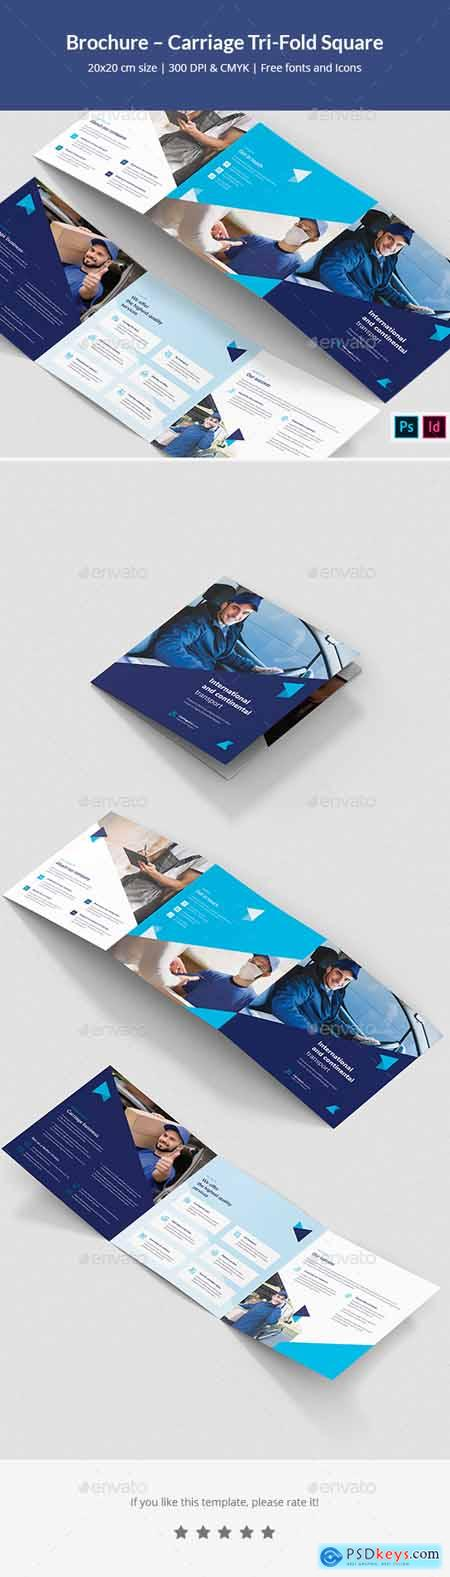 Brochure – Carriage Tri-Fold Square 28370582